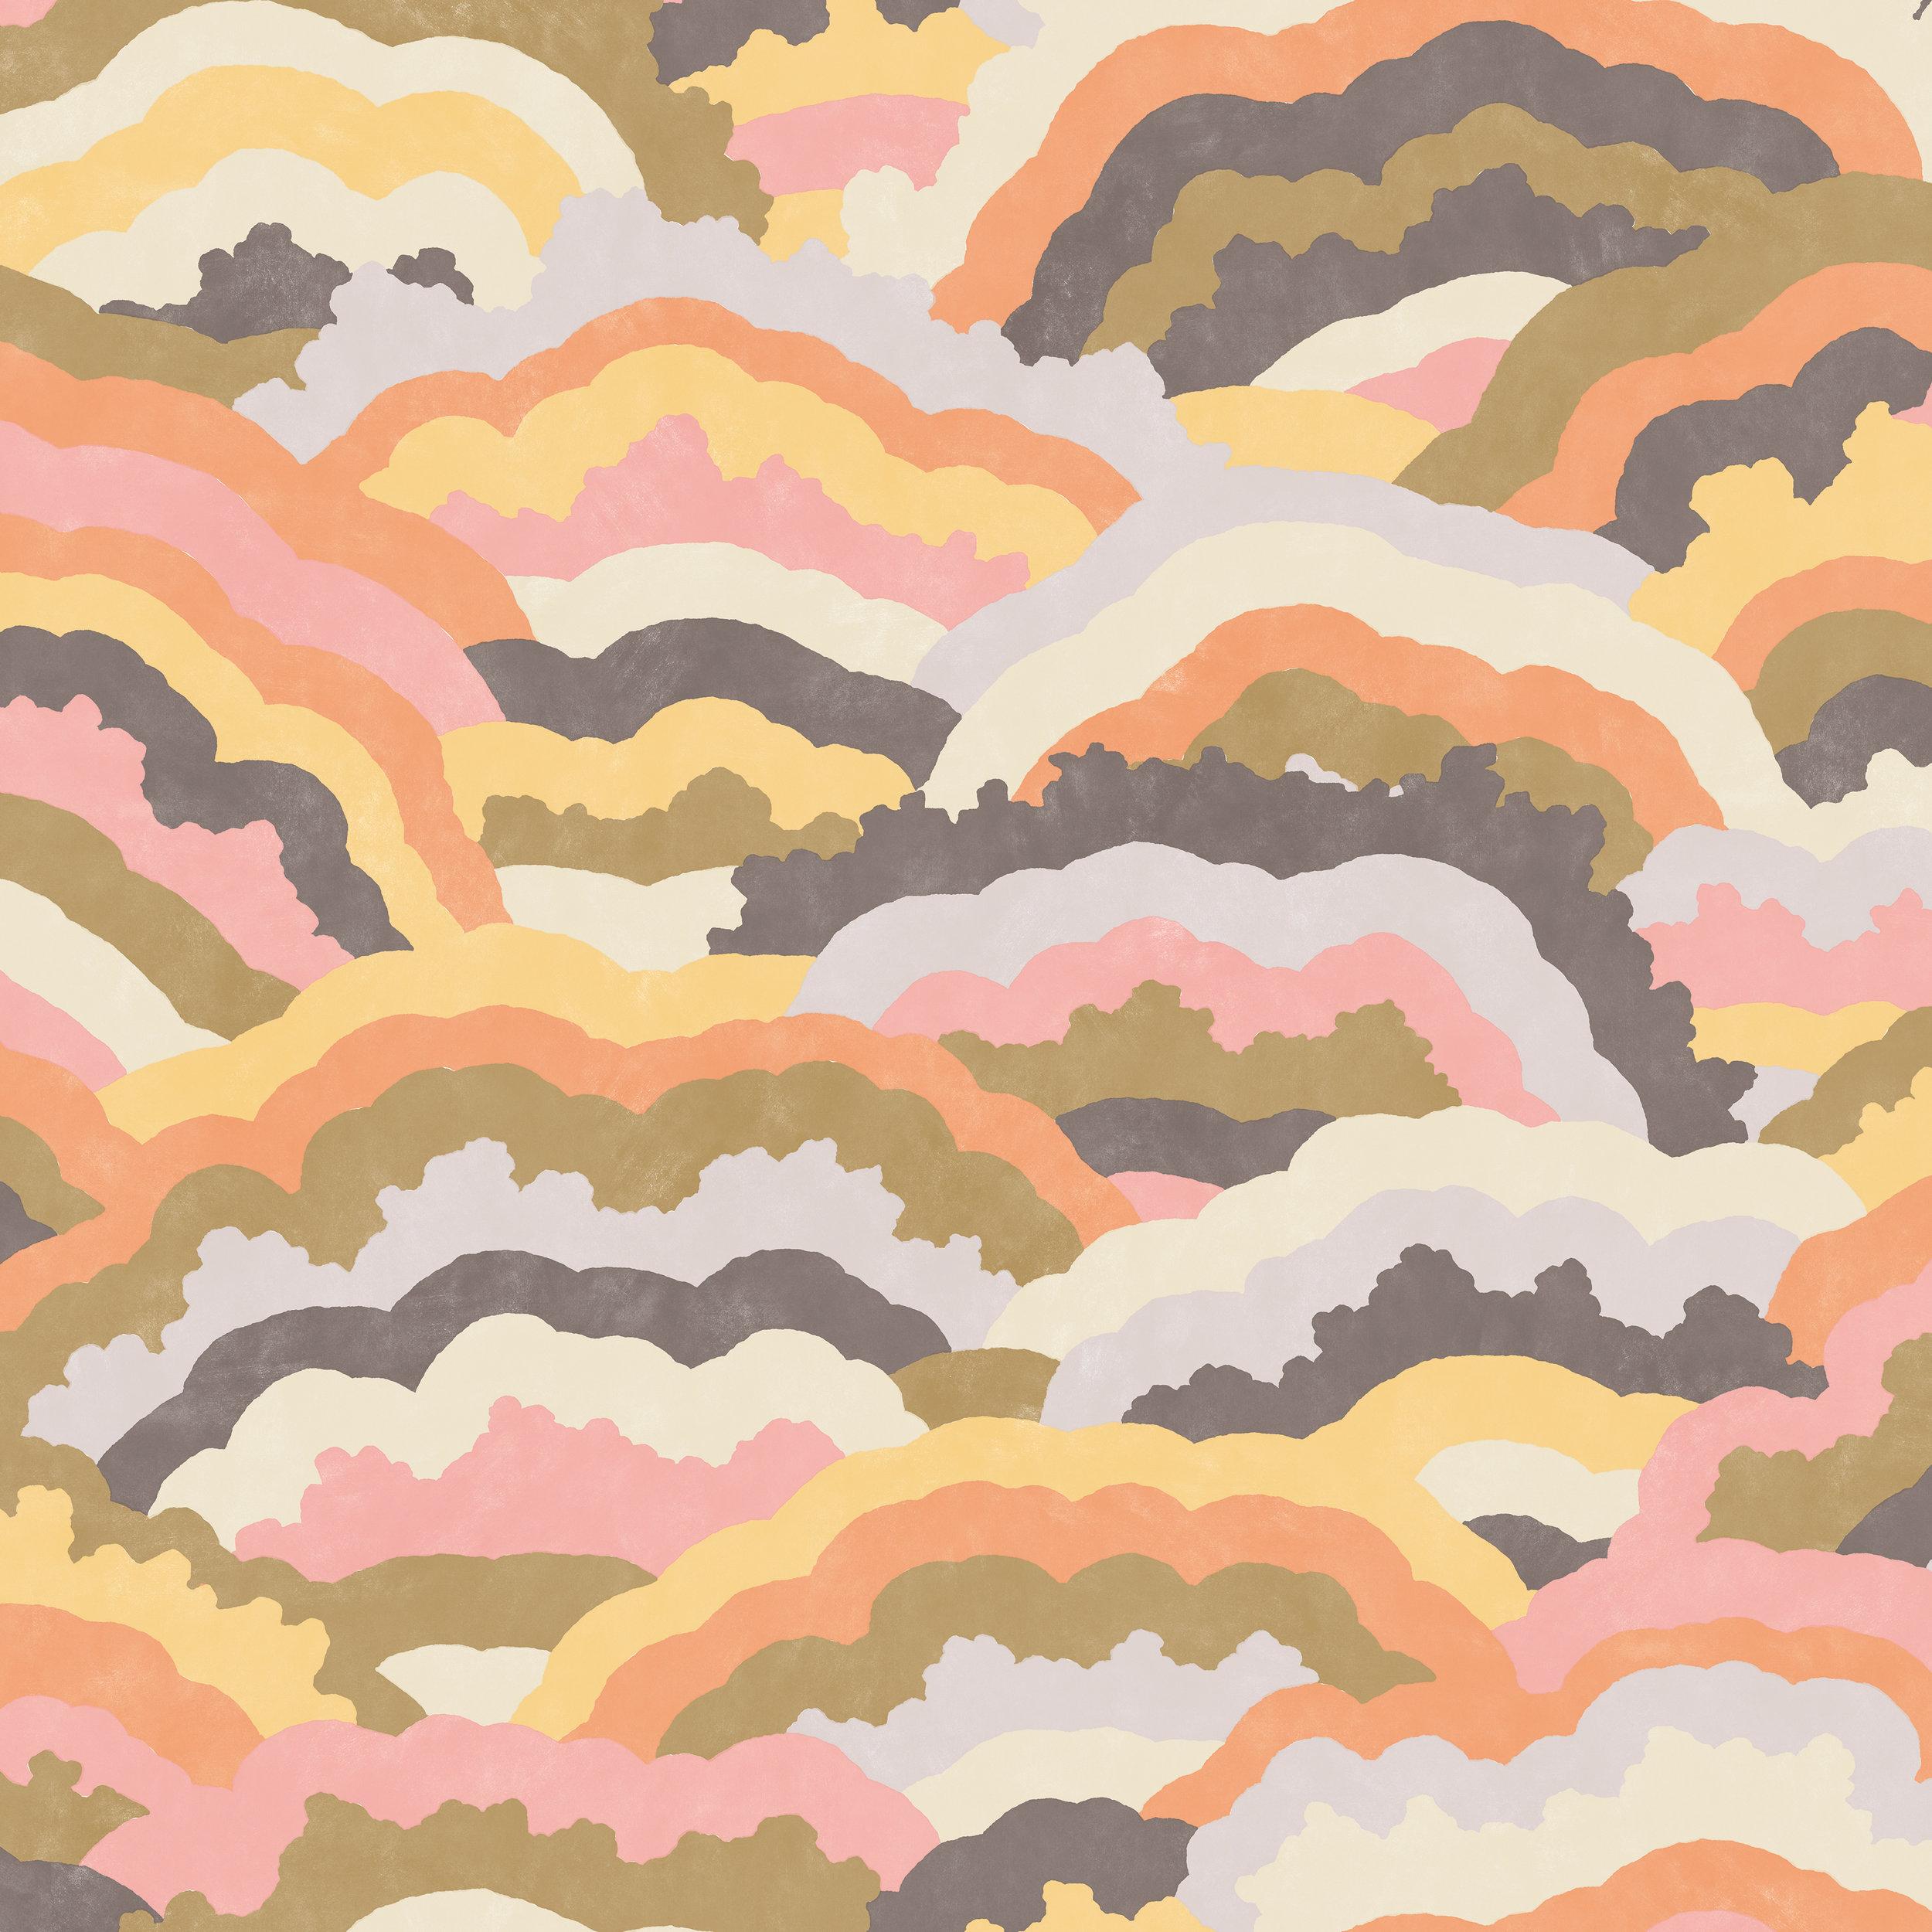 Dreamhouse_Colorway8_detail_WEB.jpg